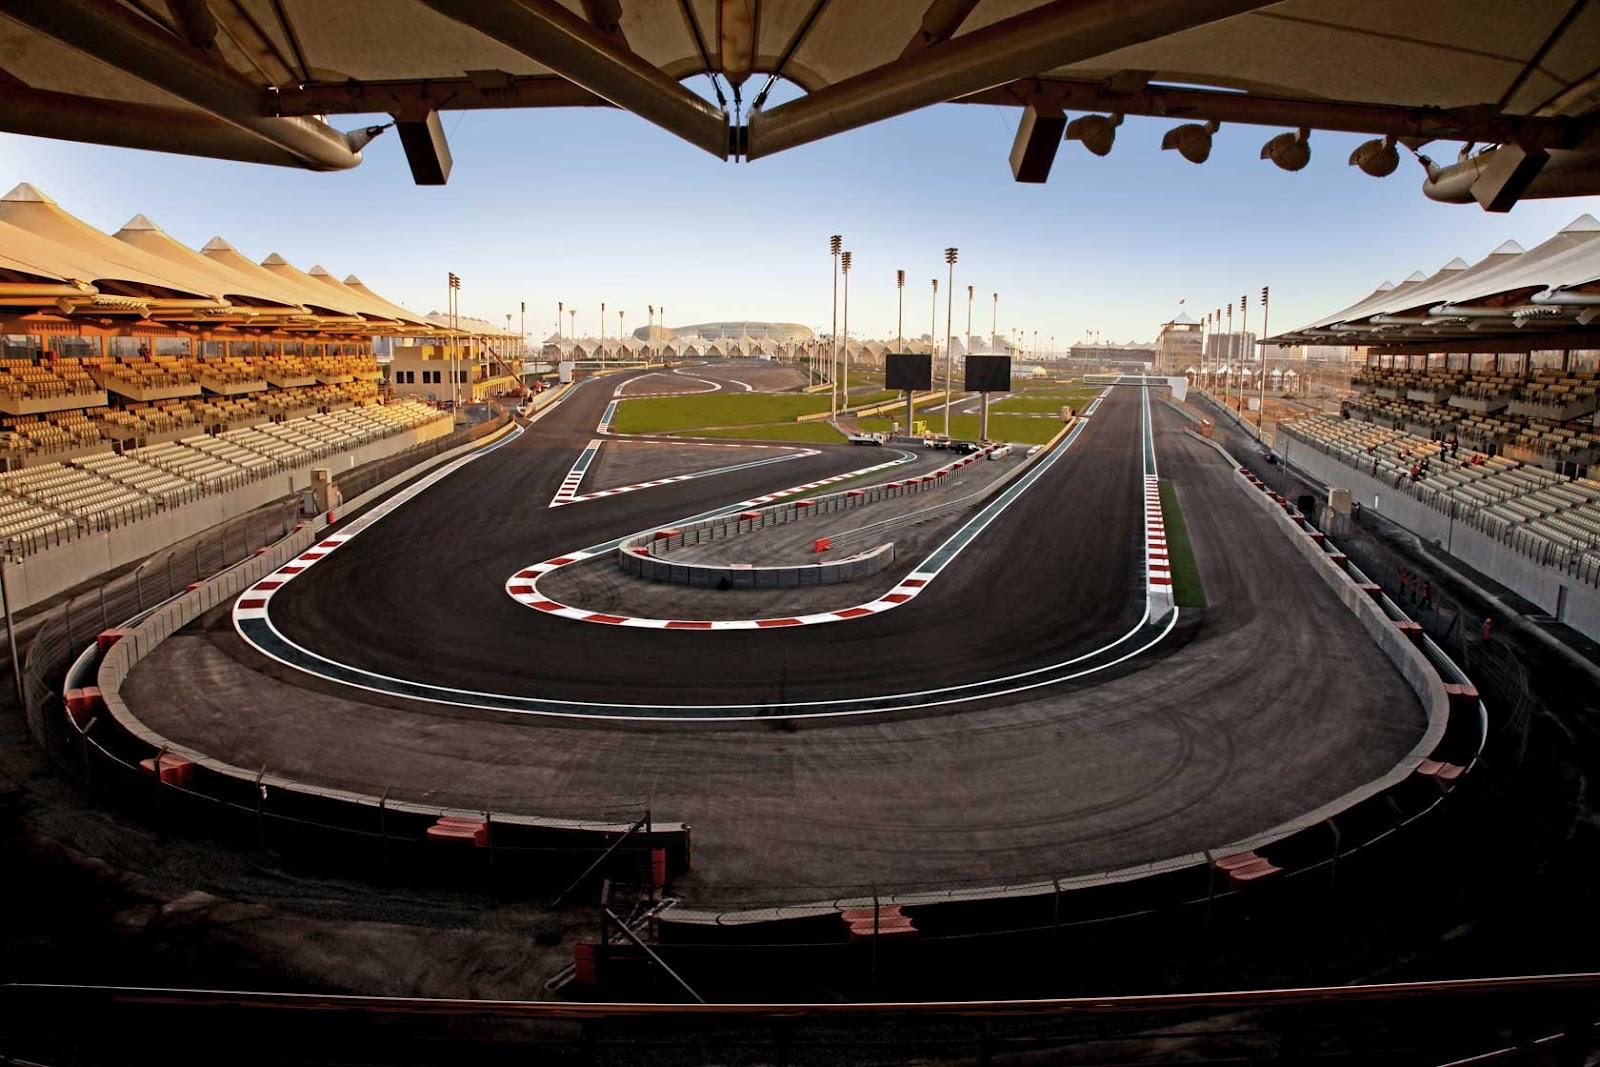 Abu Dhabi F1 Grand Prix Abu Dhabi United Arab Emirates